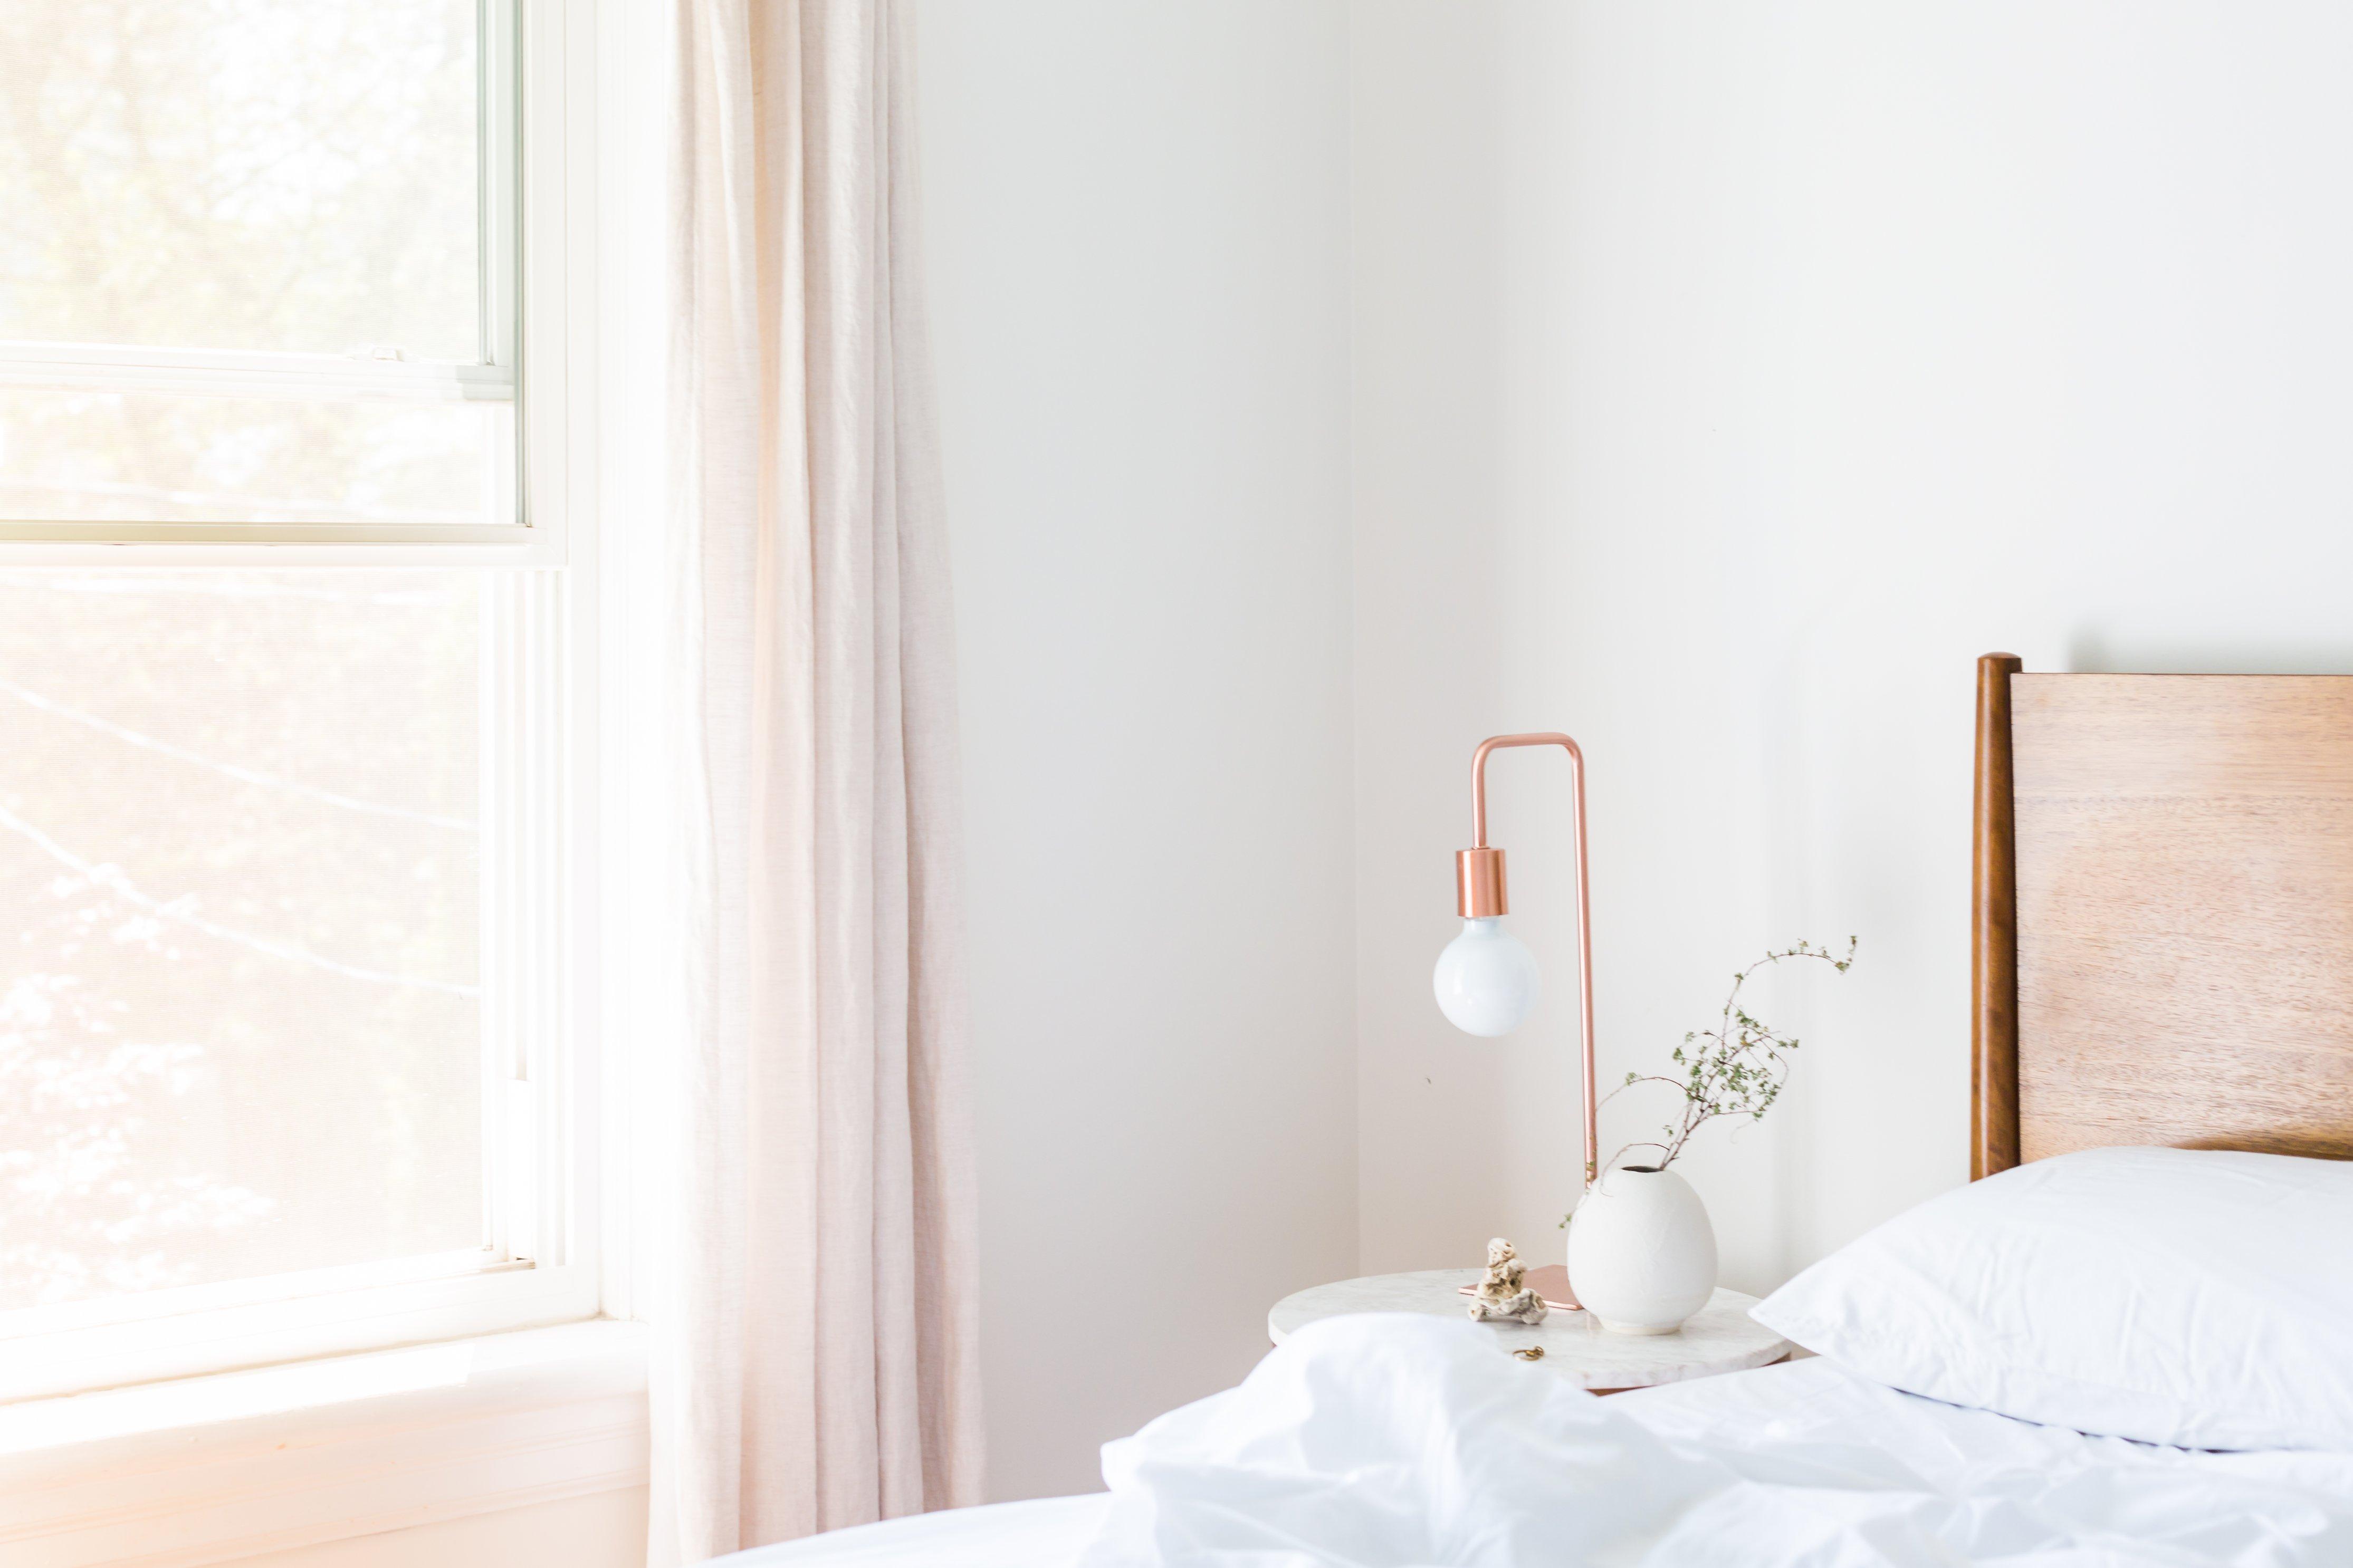 200+ Engaging Bedroom Photos · Pexels · Free Stock Photos